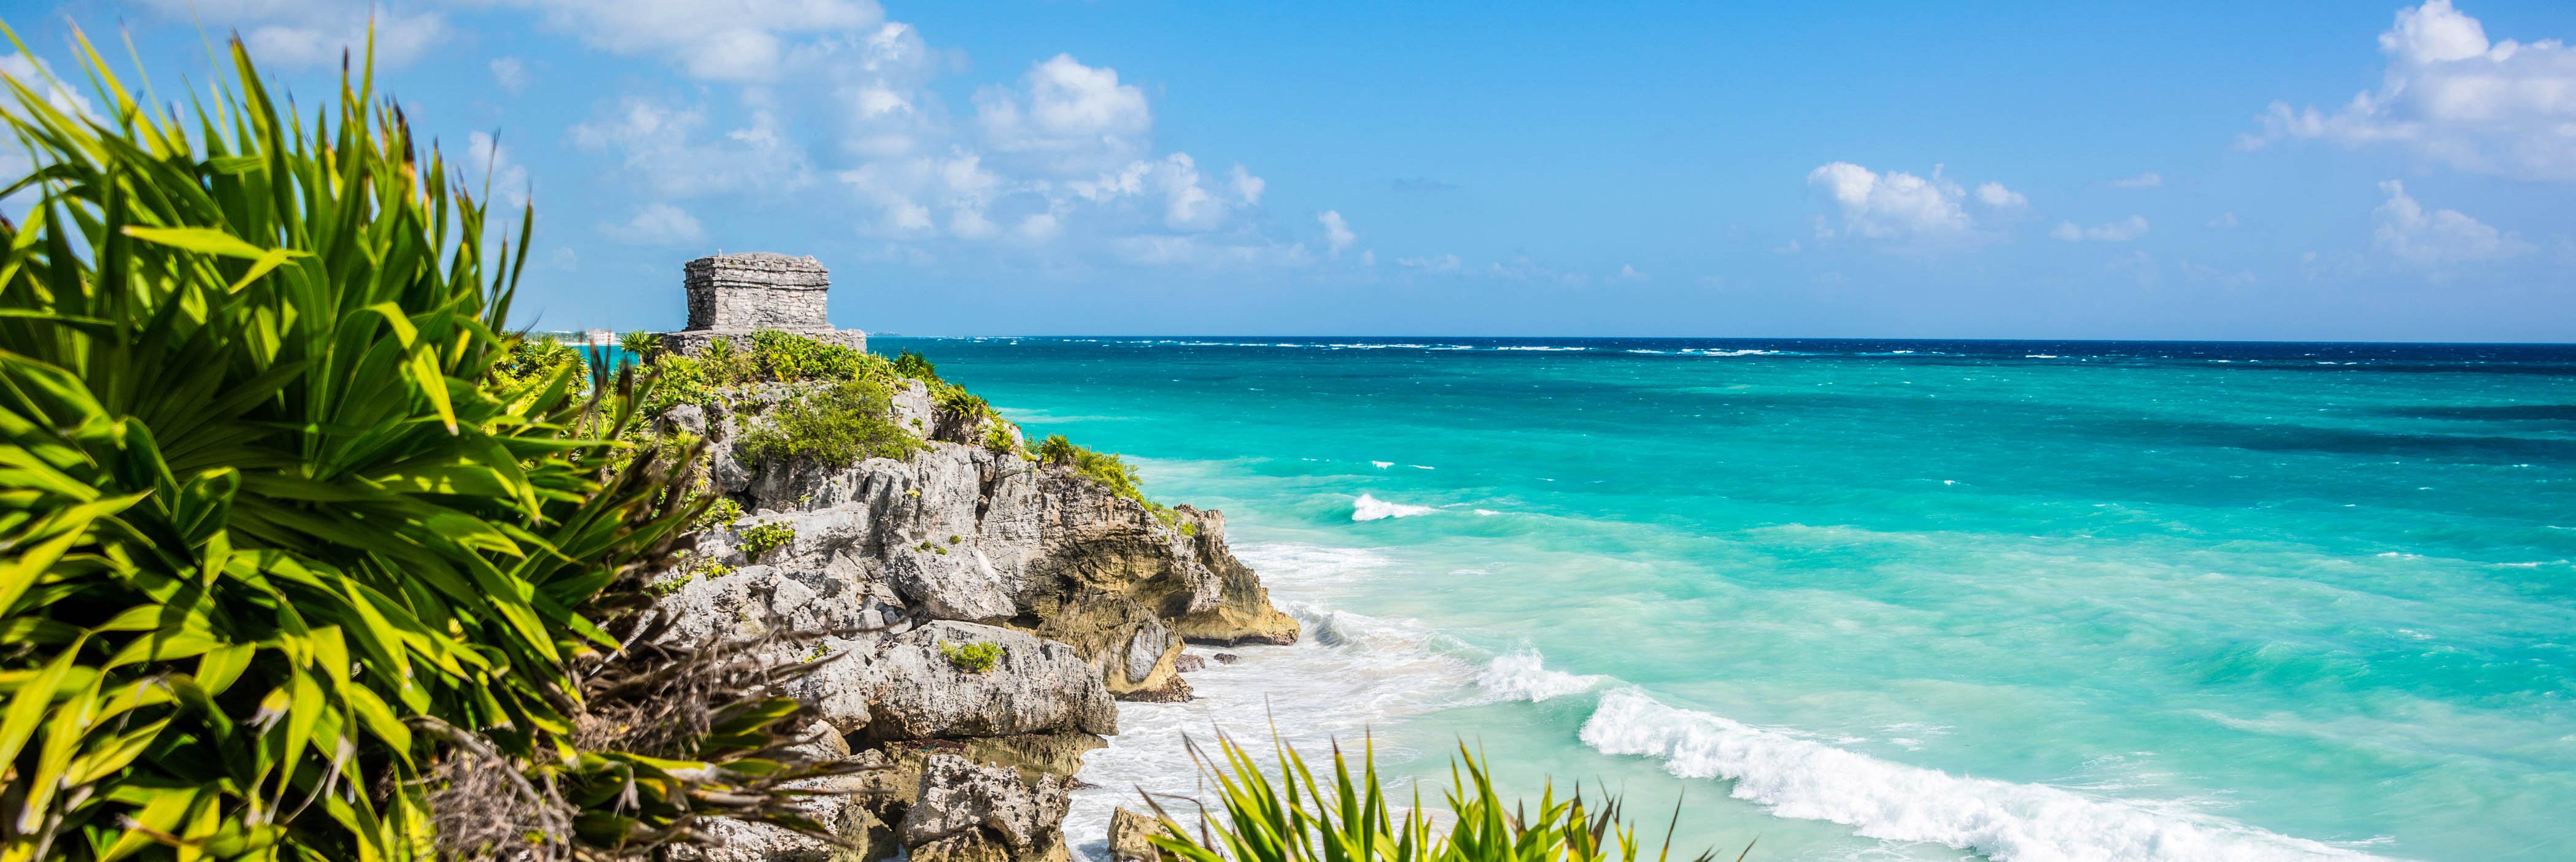 Coba Ruins Tours Riviera Maya